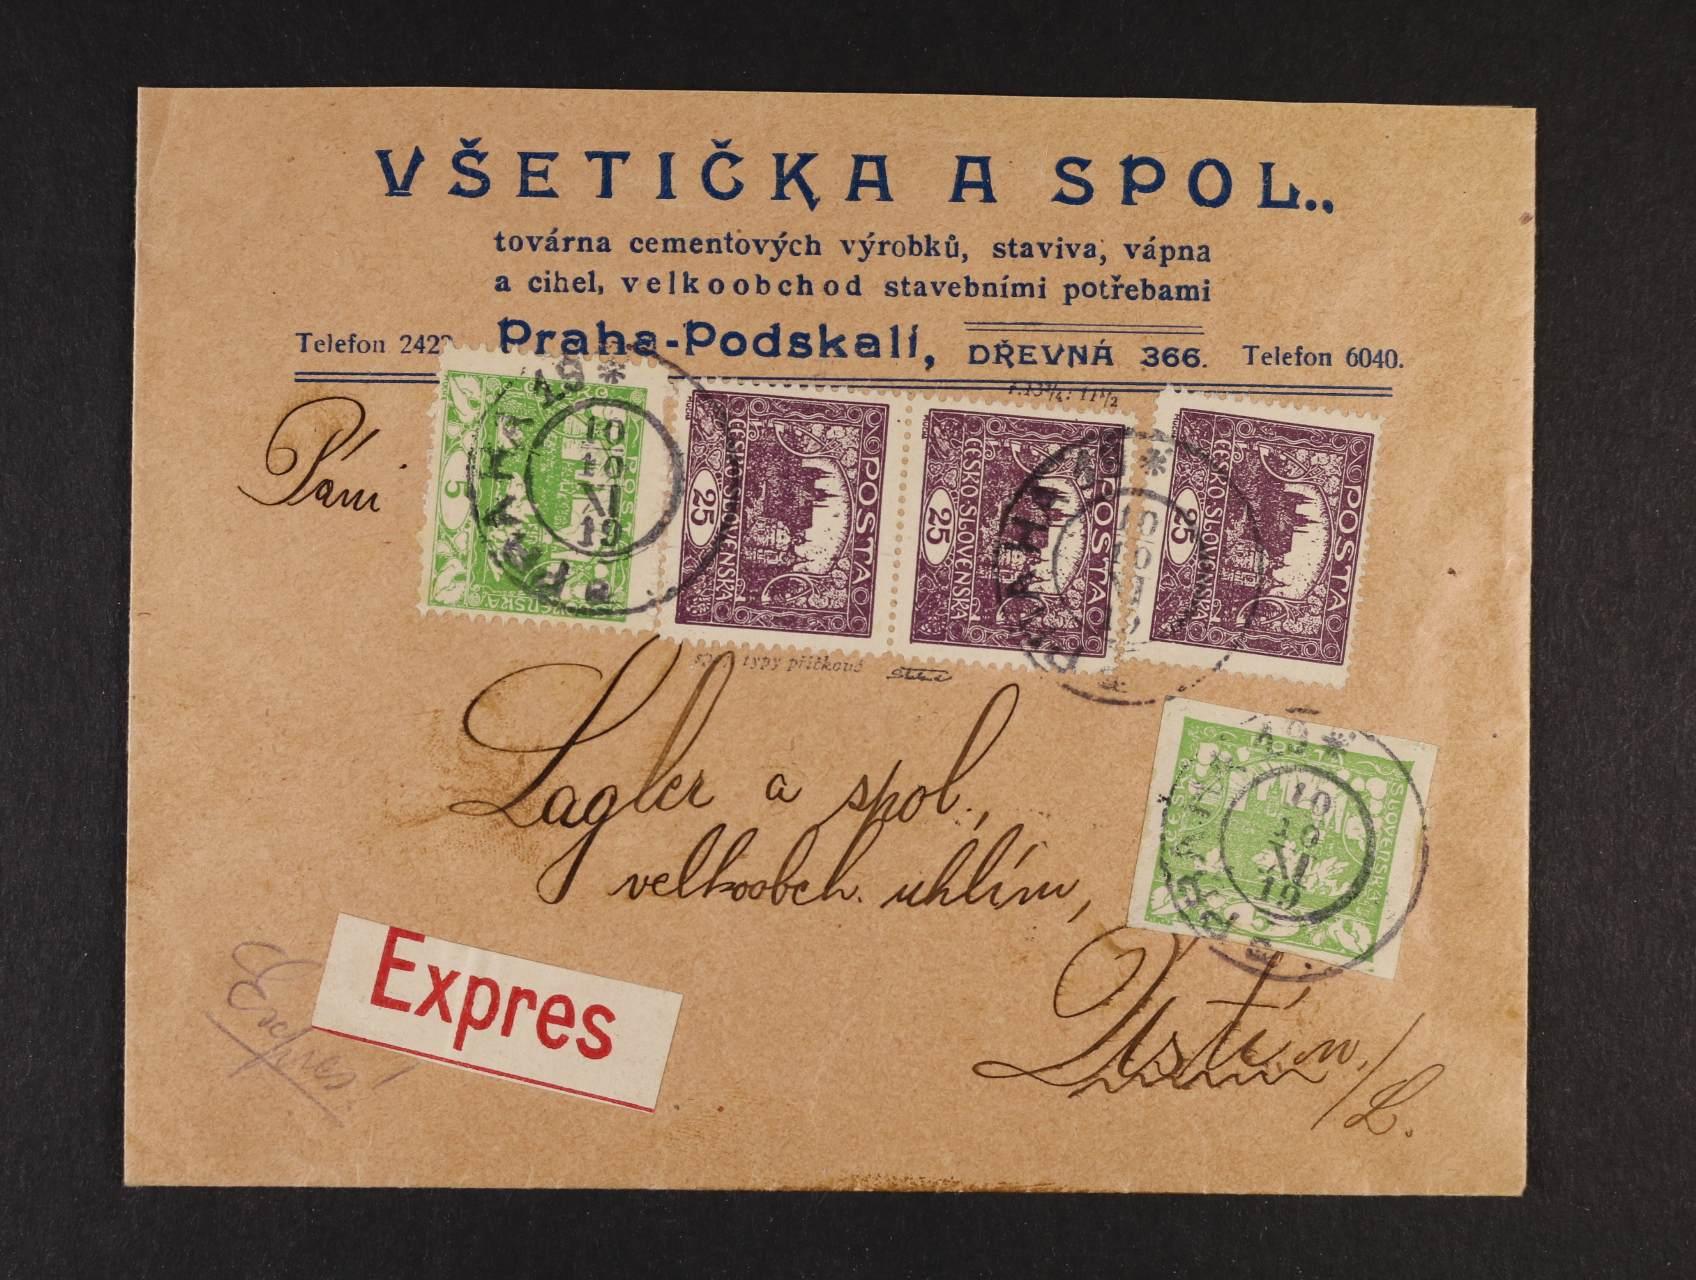 firemní EXPRES-dopis do Ústí n. L. frank. zn. č. 3 + 3 D + 11 F (1x + svislá dvoupáska STp,) TD 2, ZP 56, pod. raz. PRAHA 19 10.10.19, zk. Škaloud